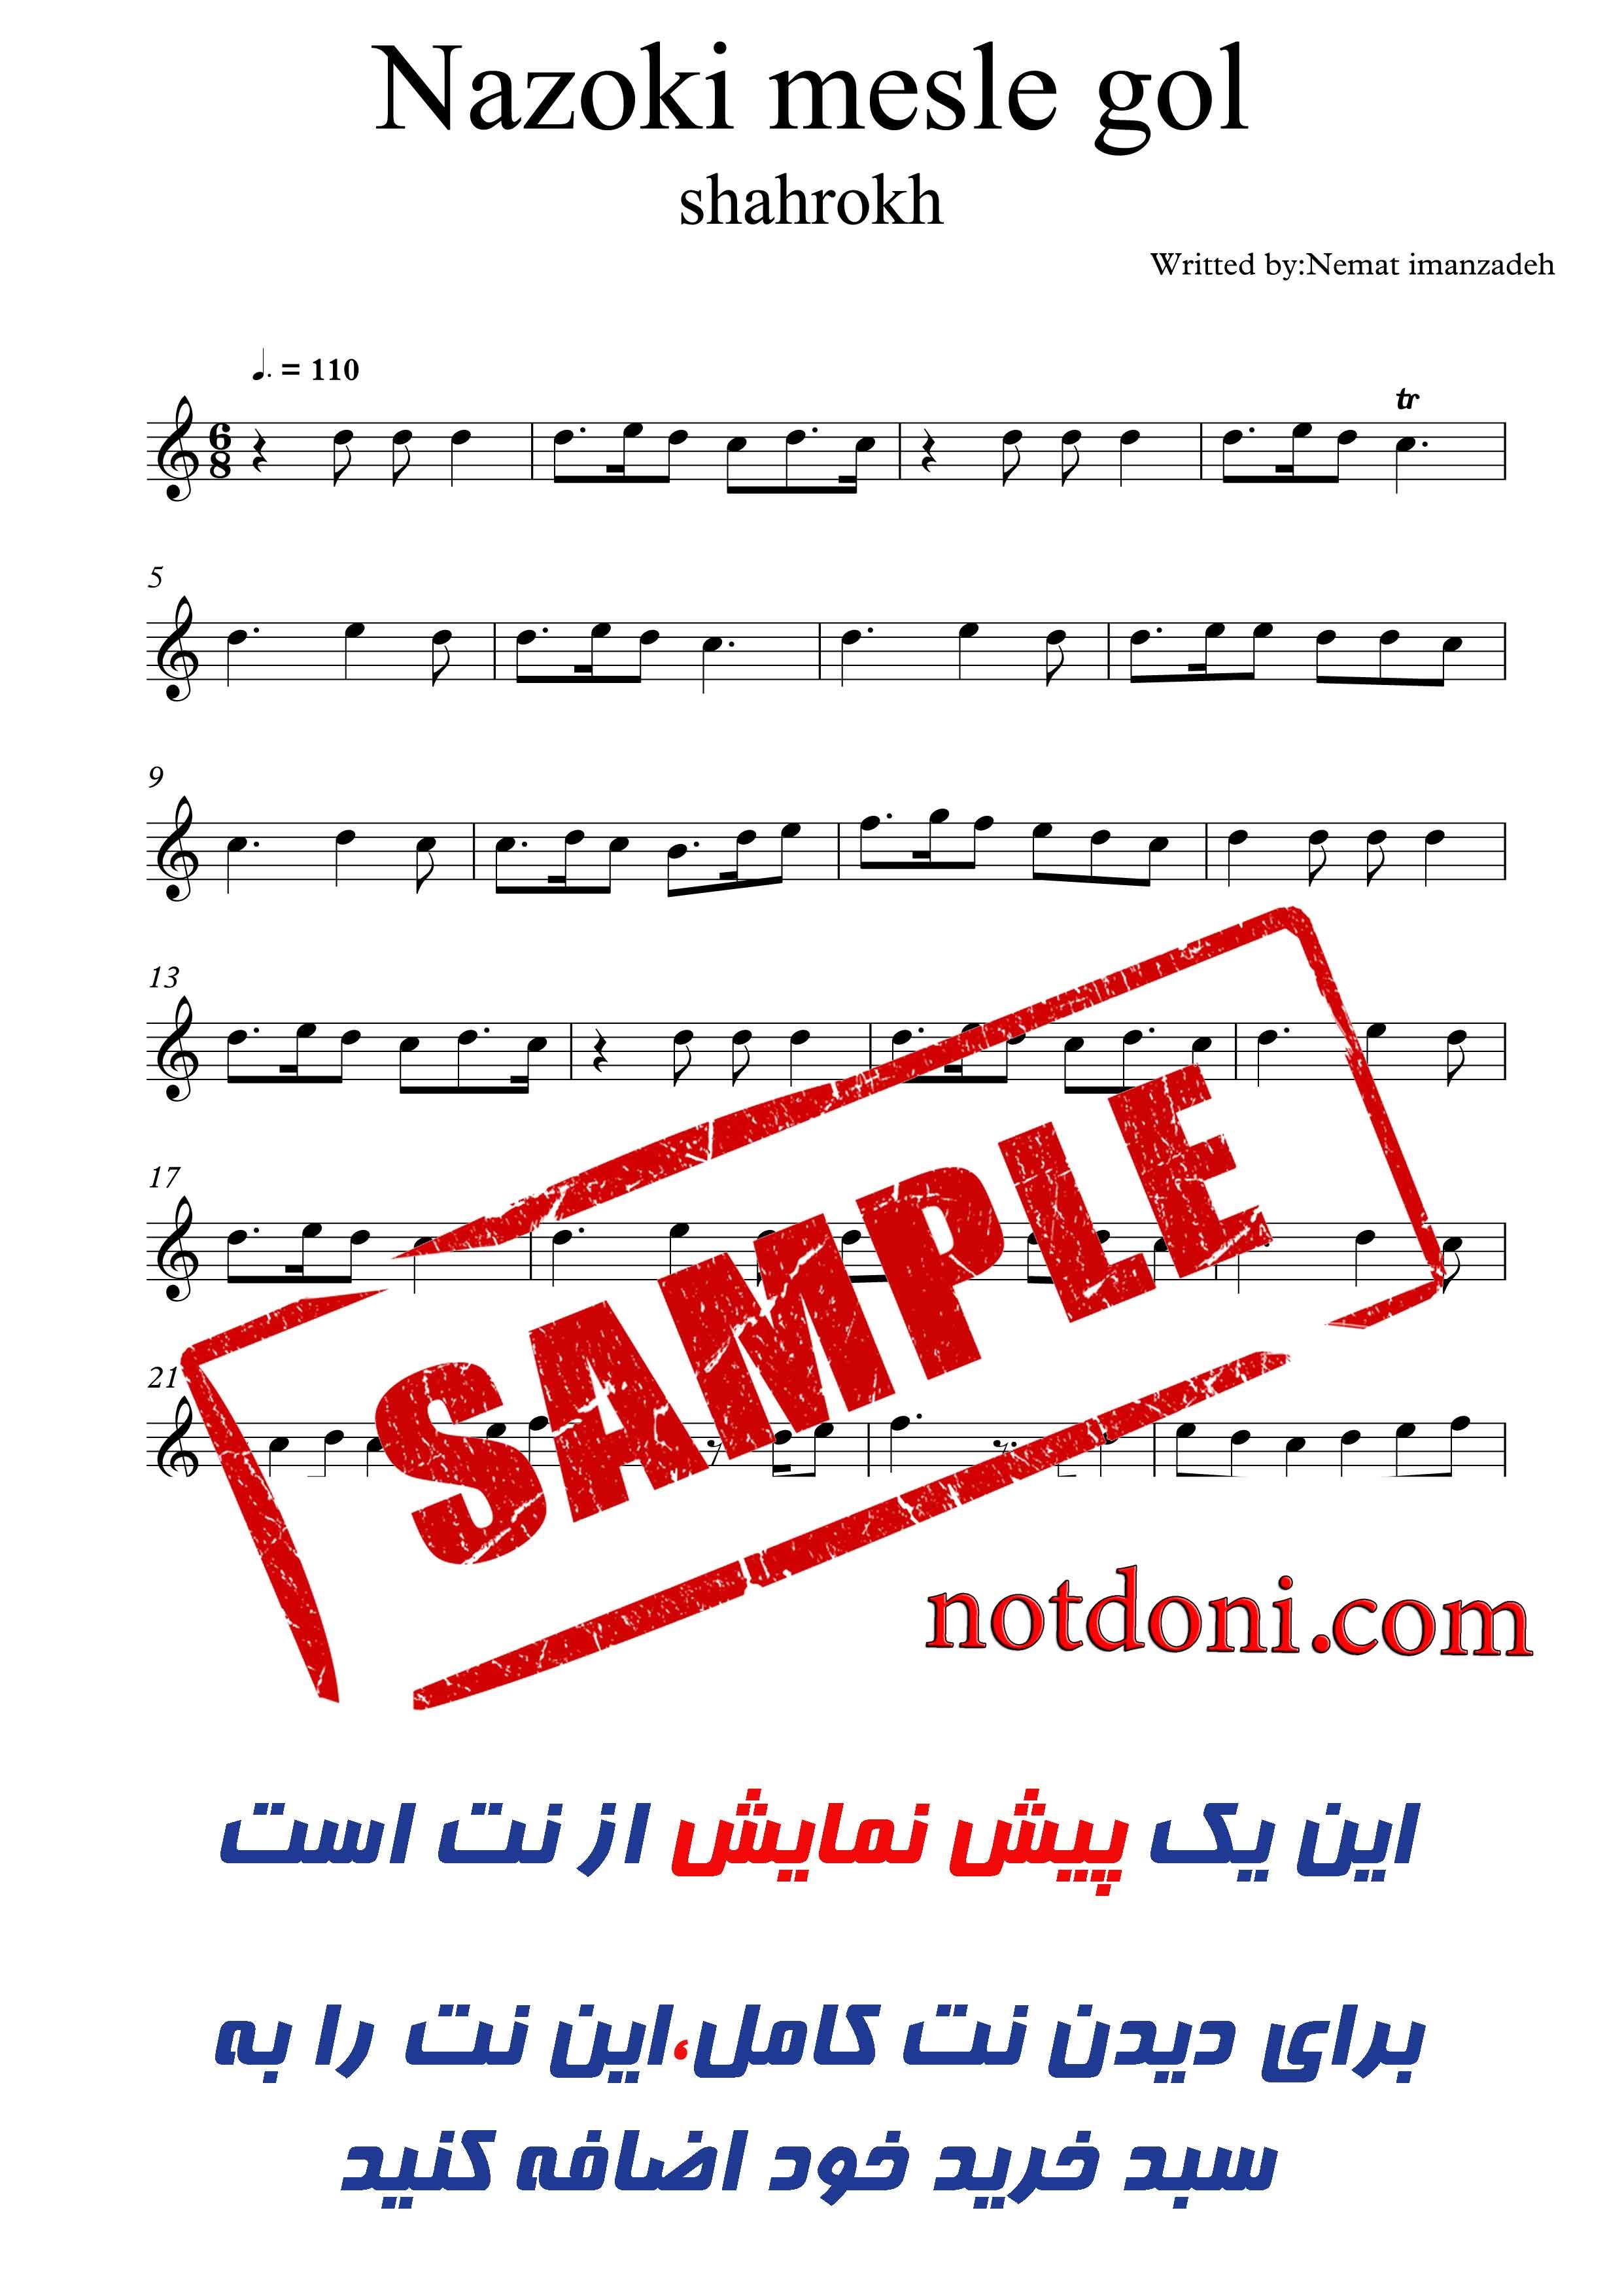 795e4a6b-b4f4-438b-a180-02b0aec00899_نت-آهنگ.jpg